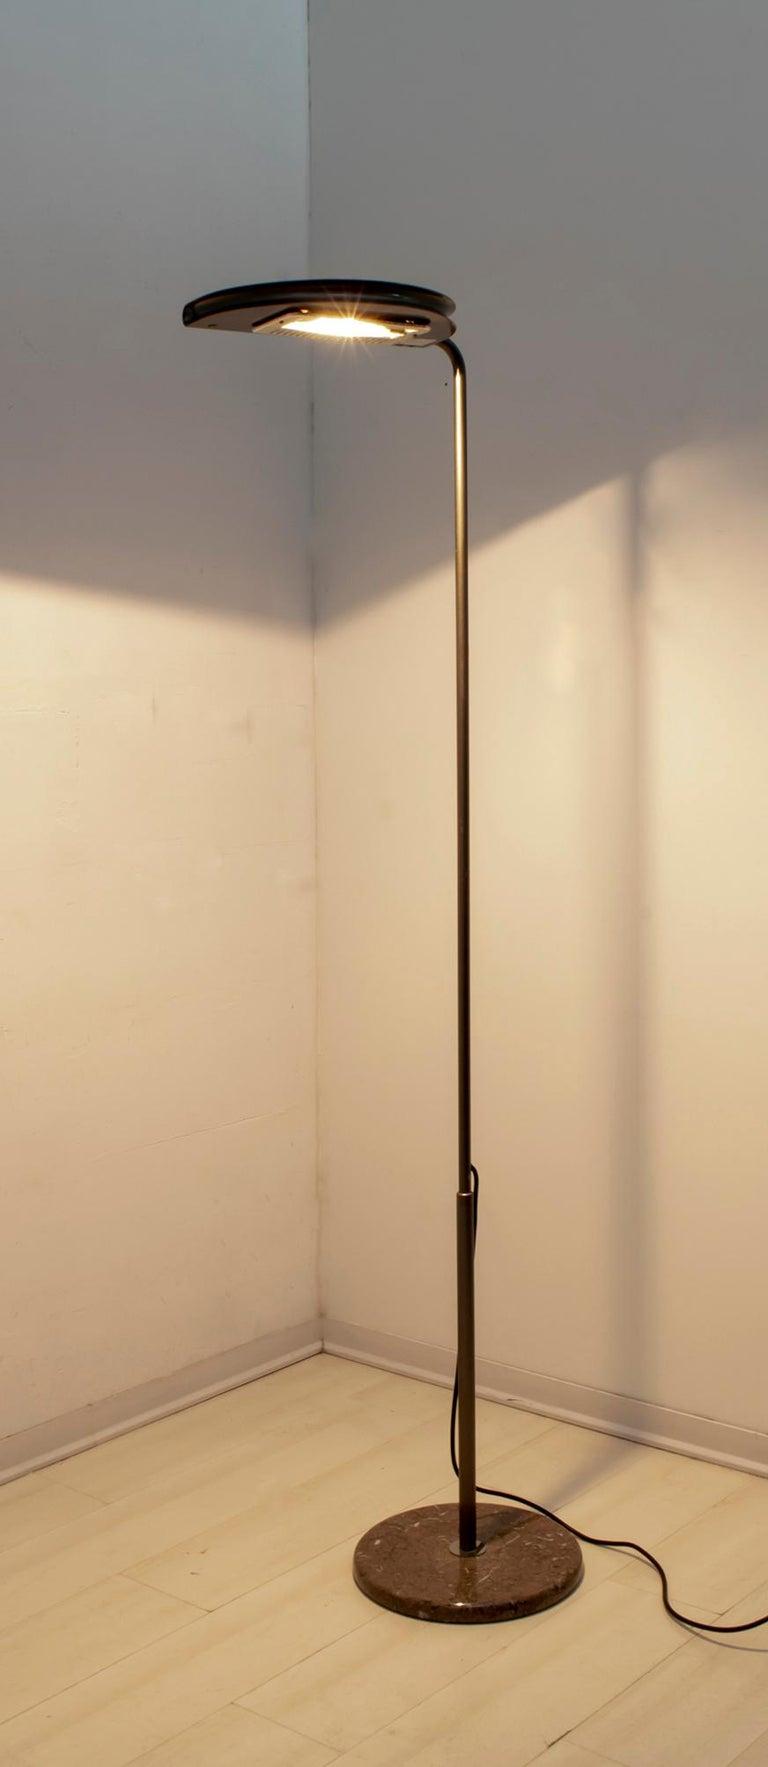 Italian Bruno Gecchelin Mid-Century Modern 'Mezzaluna' Floor Lamp for Skipper Pollux For Sale